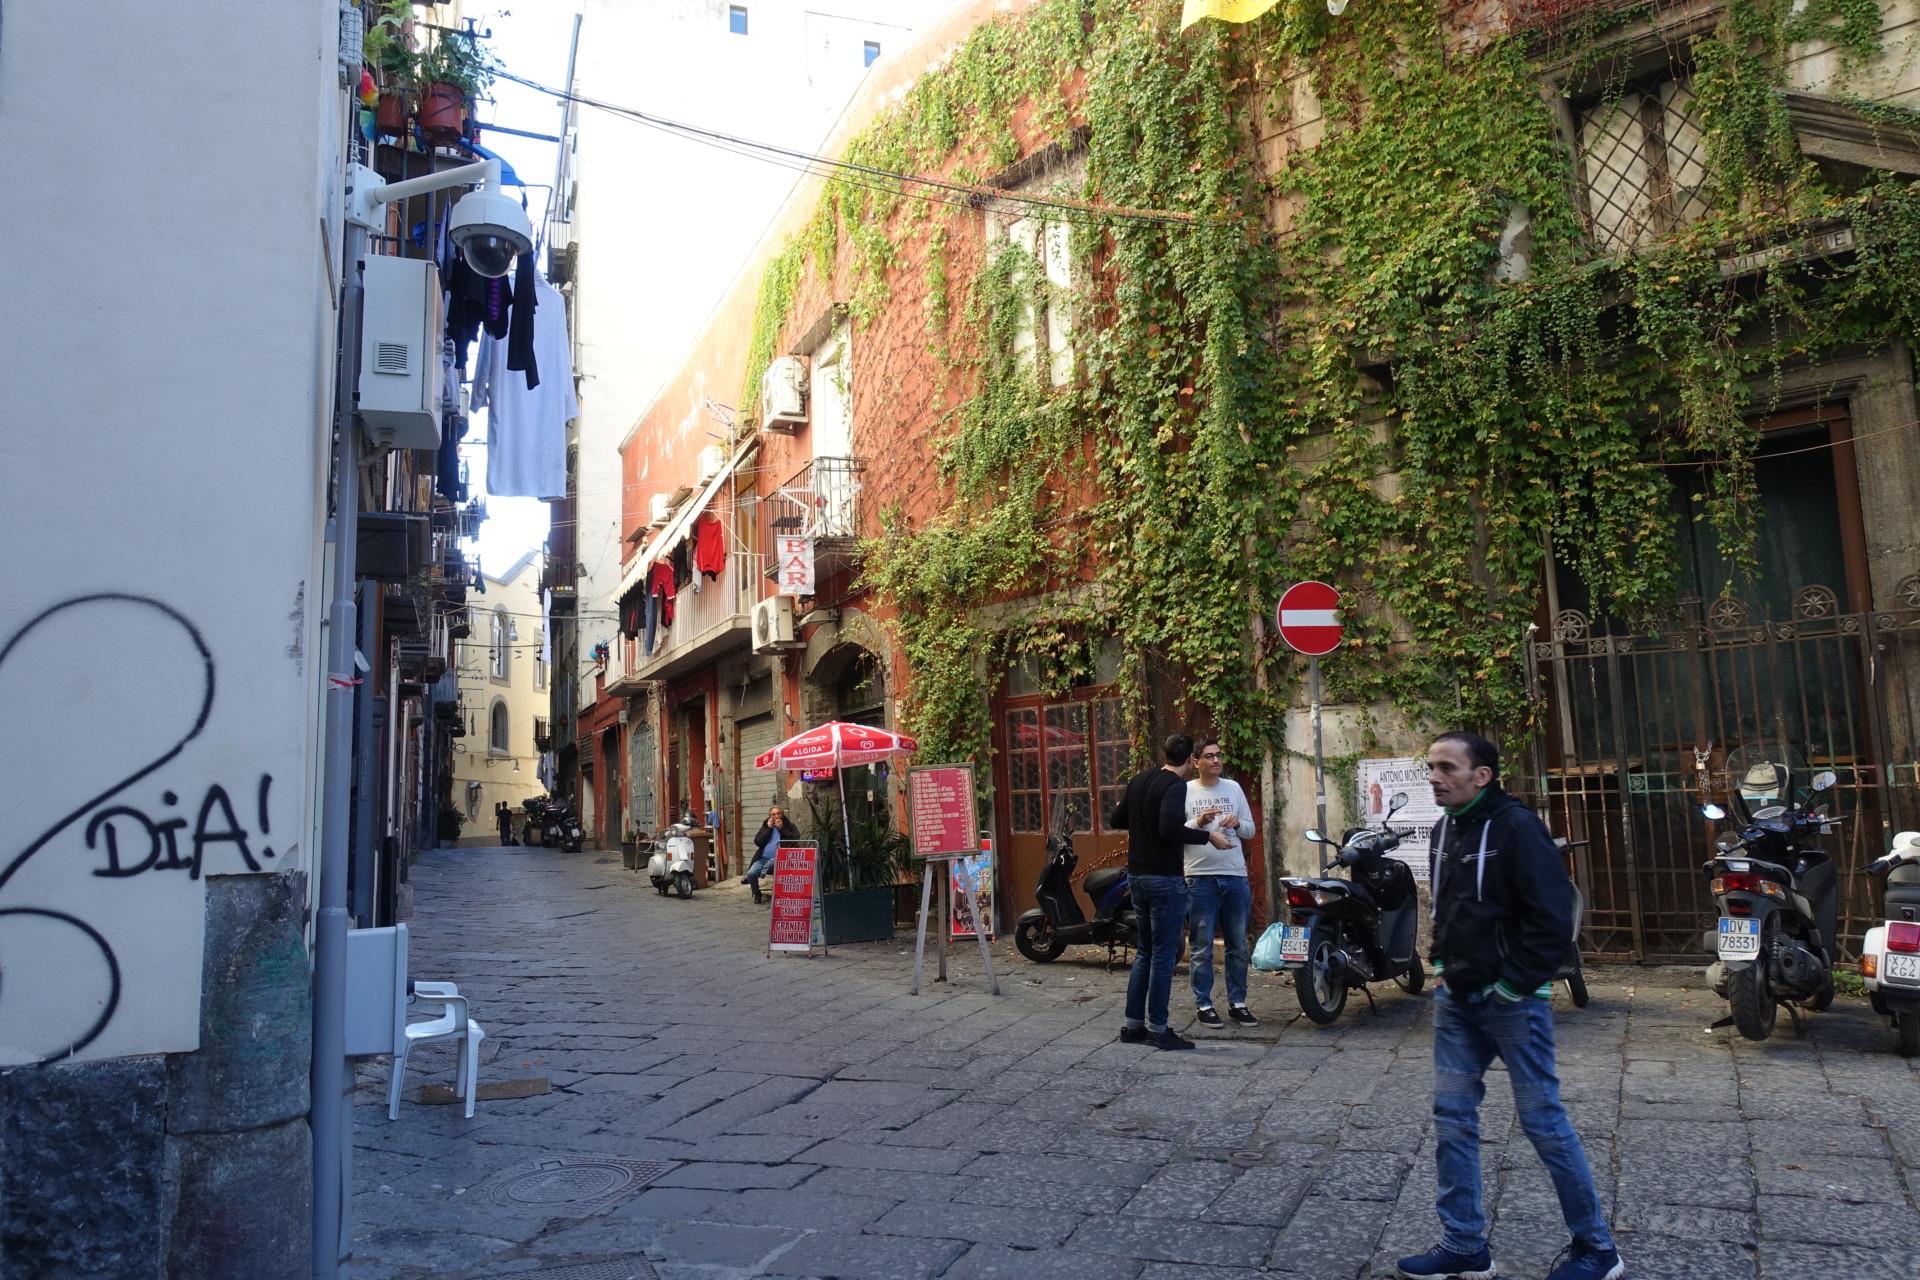 Im centro storico von Neapel